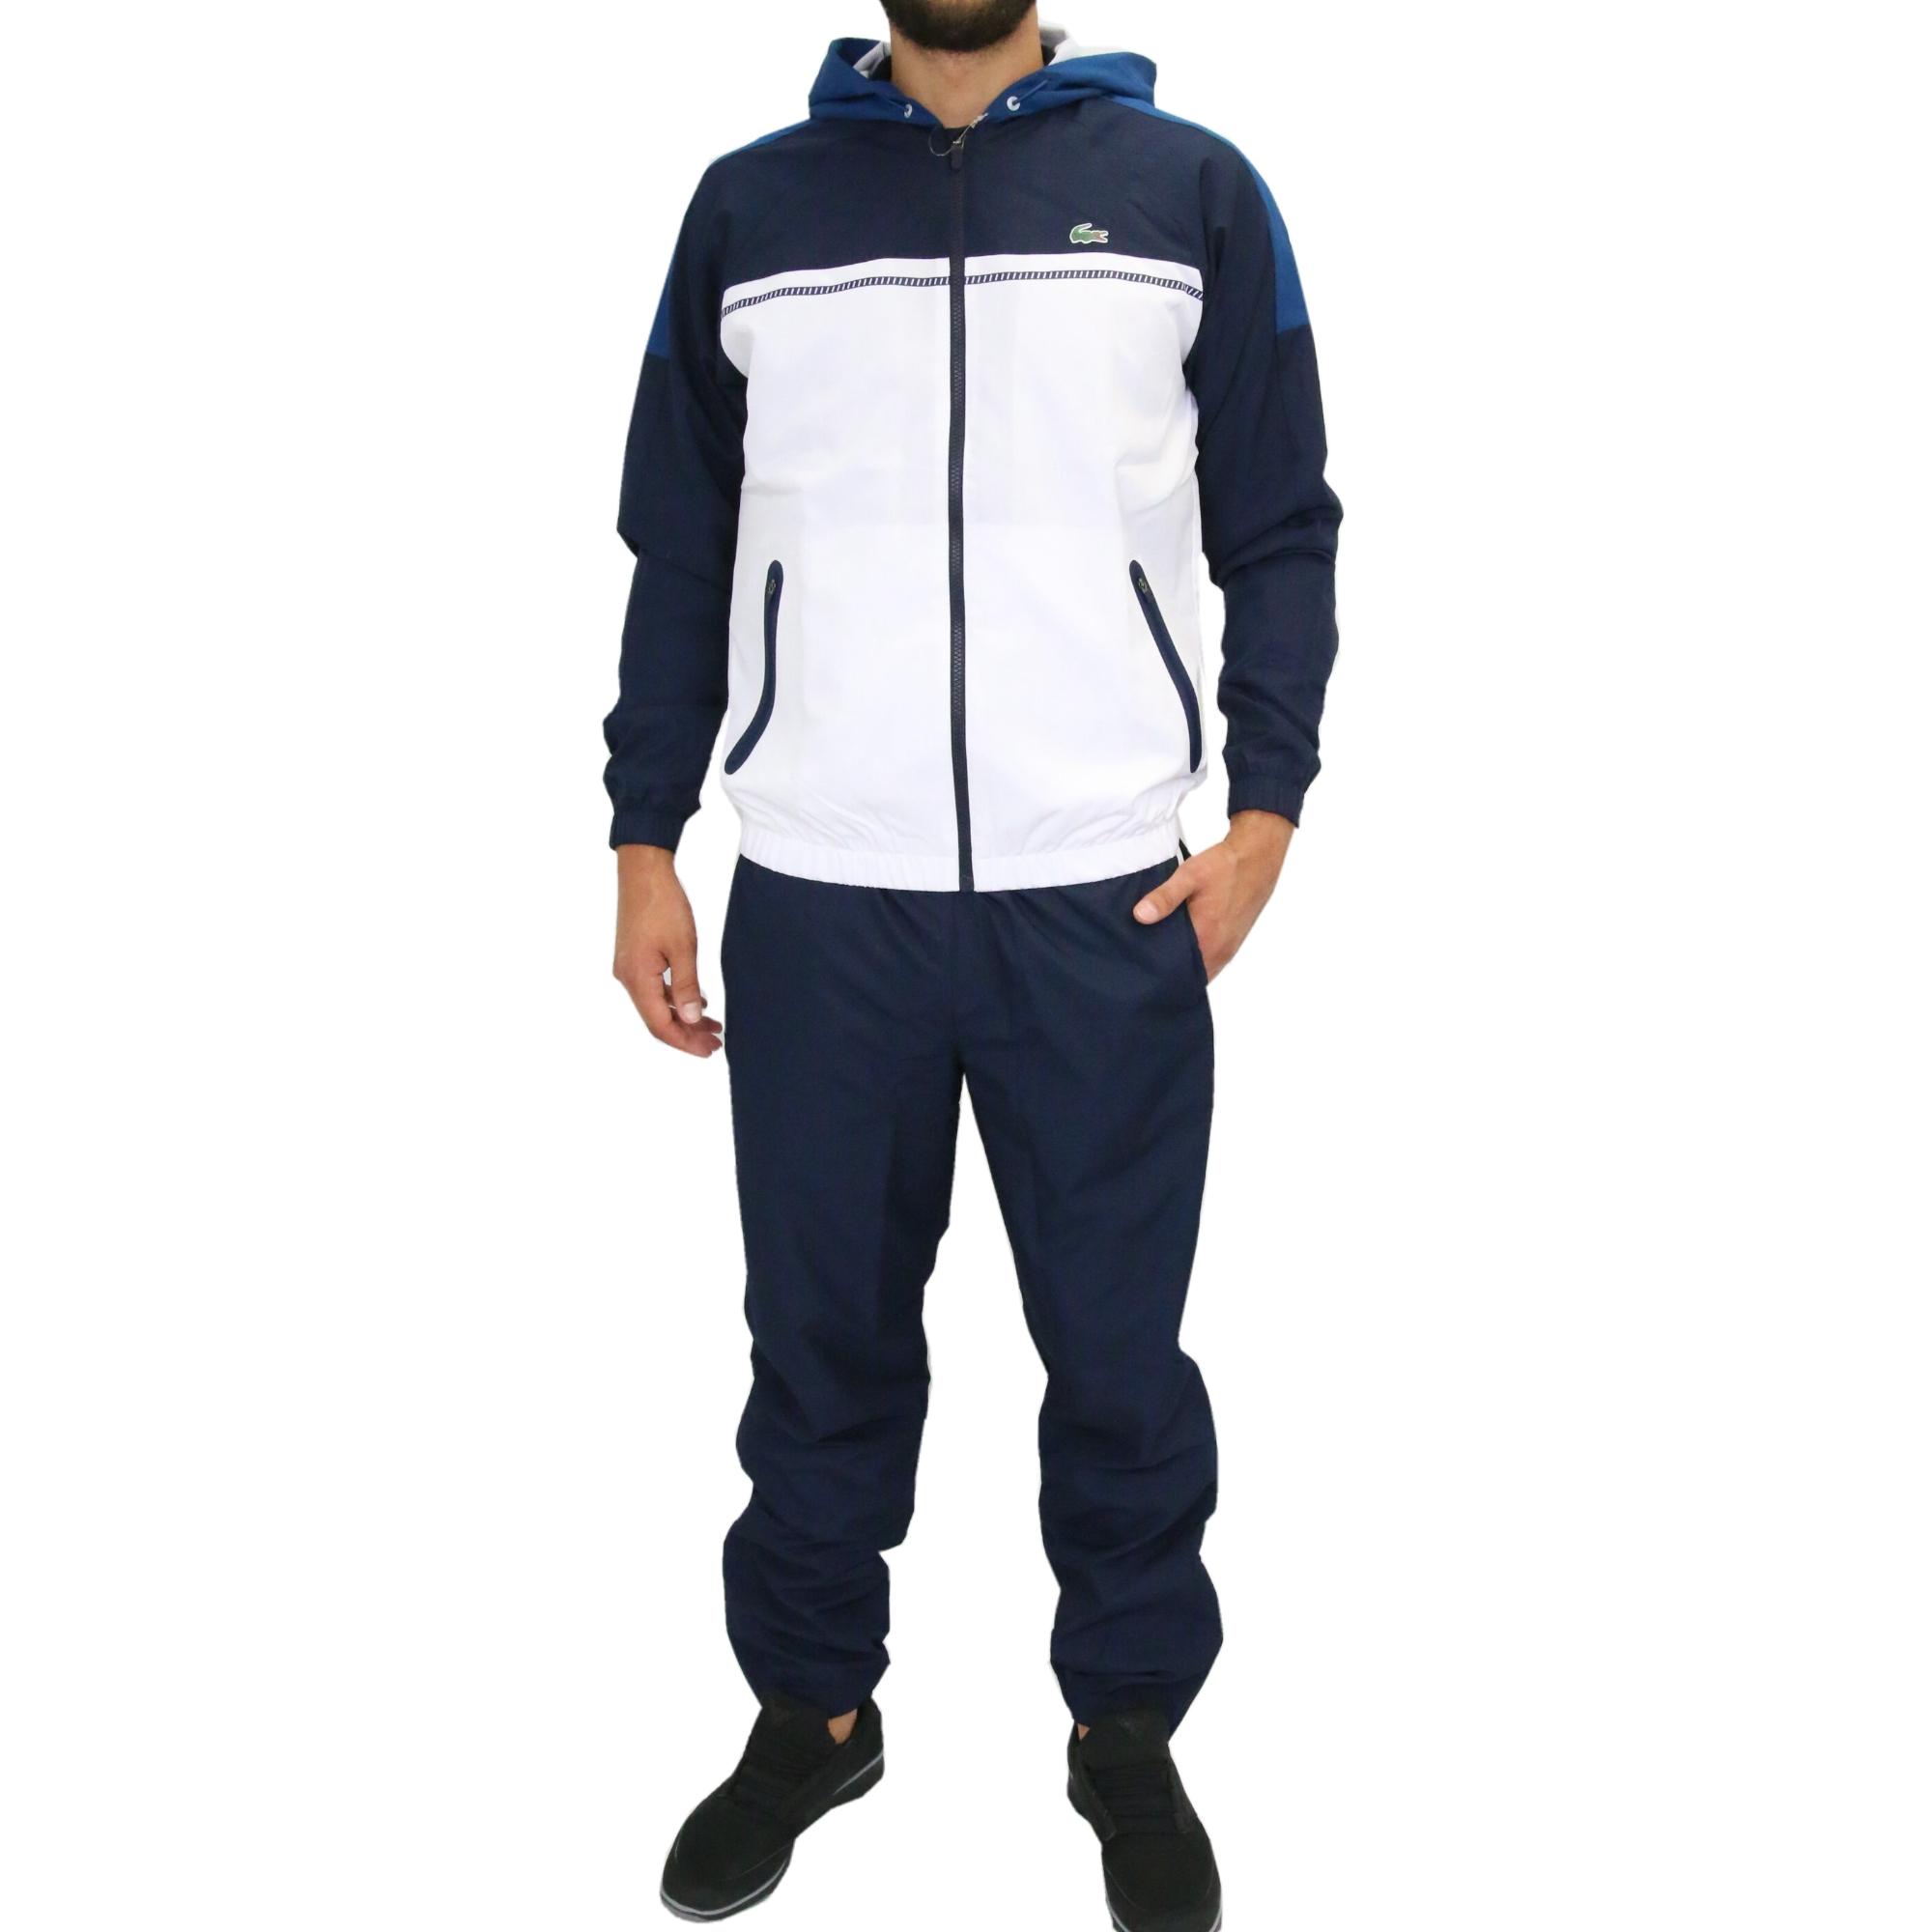 lacoste sport trainingsanzug sportanzug jogginganzug herren blau wh9161 ula ebay. Black Bedroom Furniture Sets. Home Design Ideas